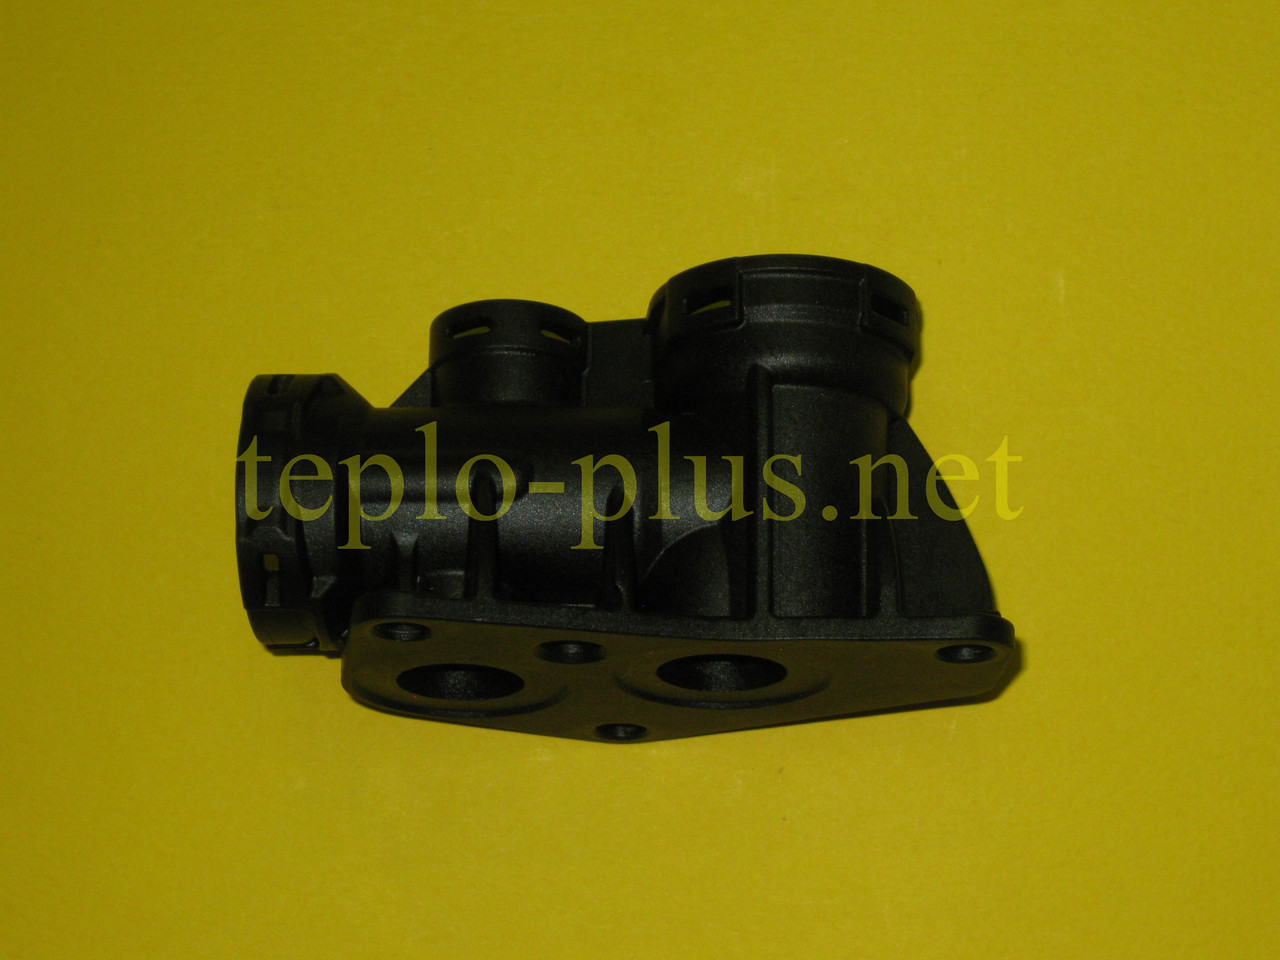 Соединительная деталь 179031 Vaillant atmoTEC Pro / Plus, turboTEC Pro / Plus, ecoTEC Pro / Plus, фото 2